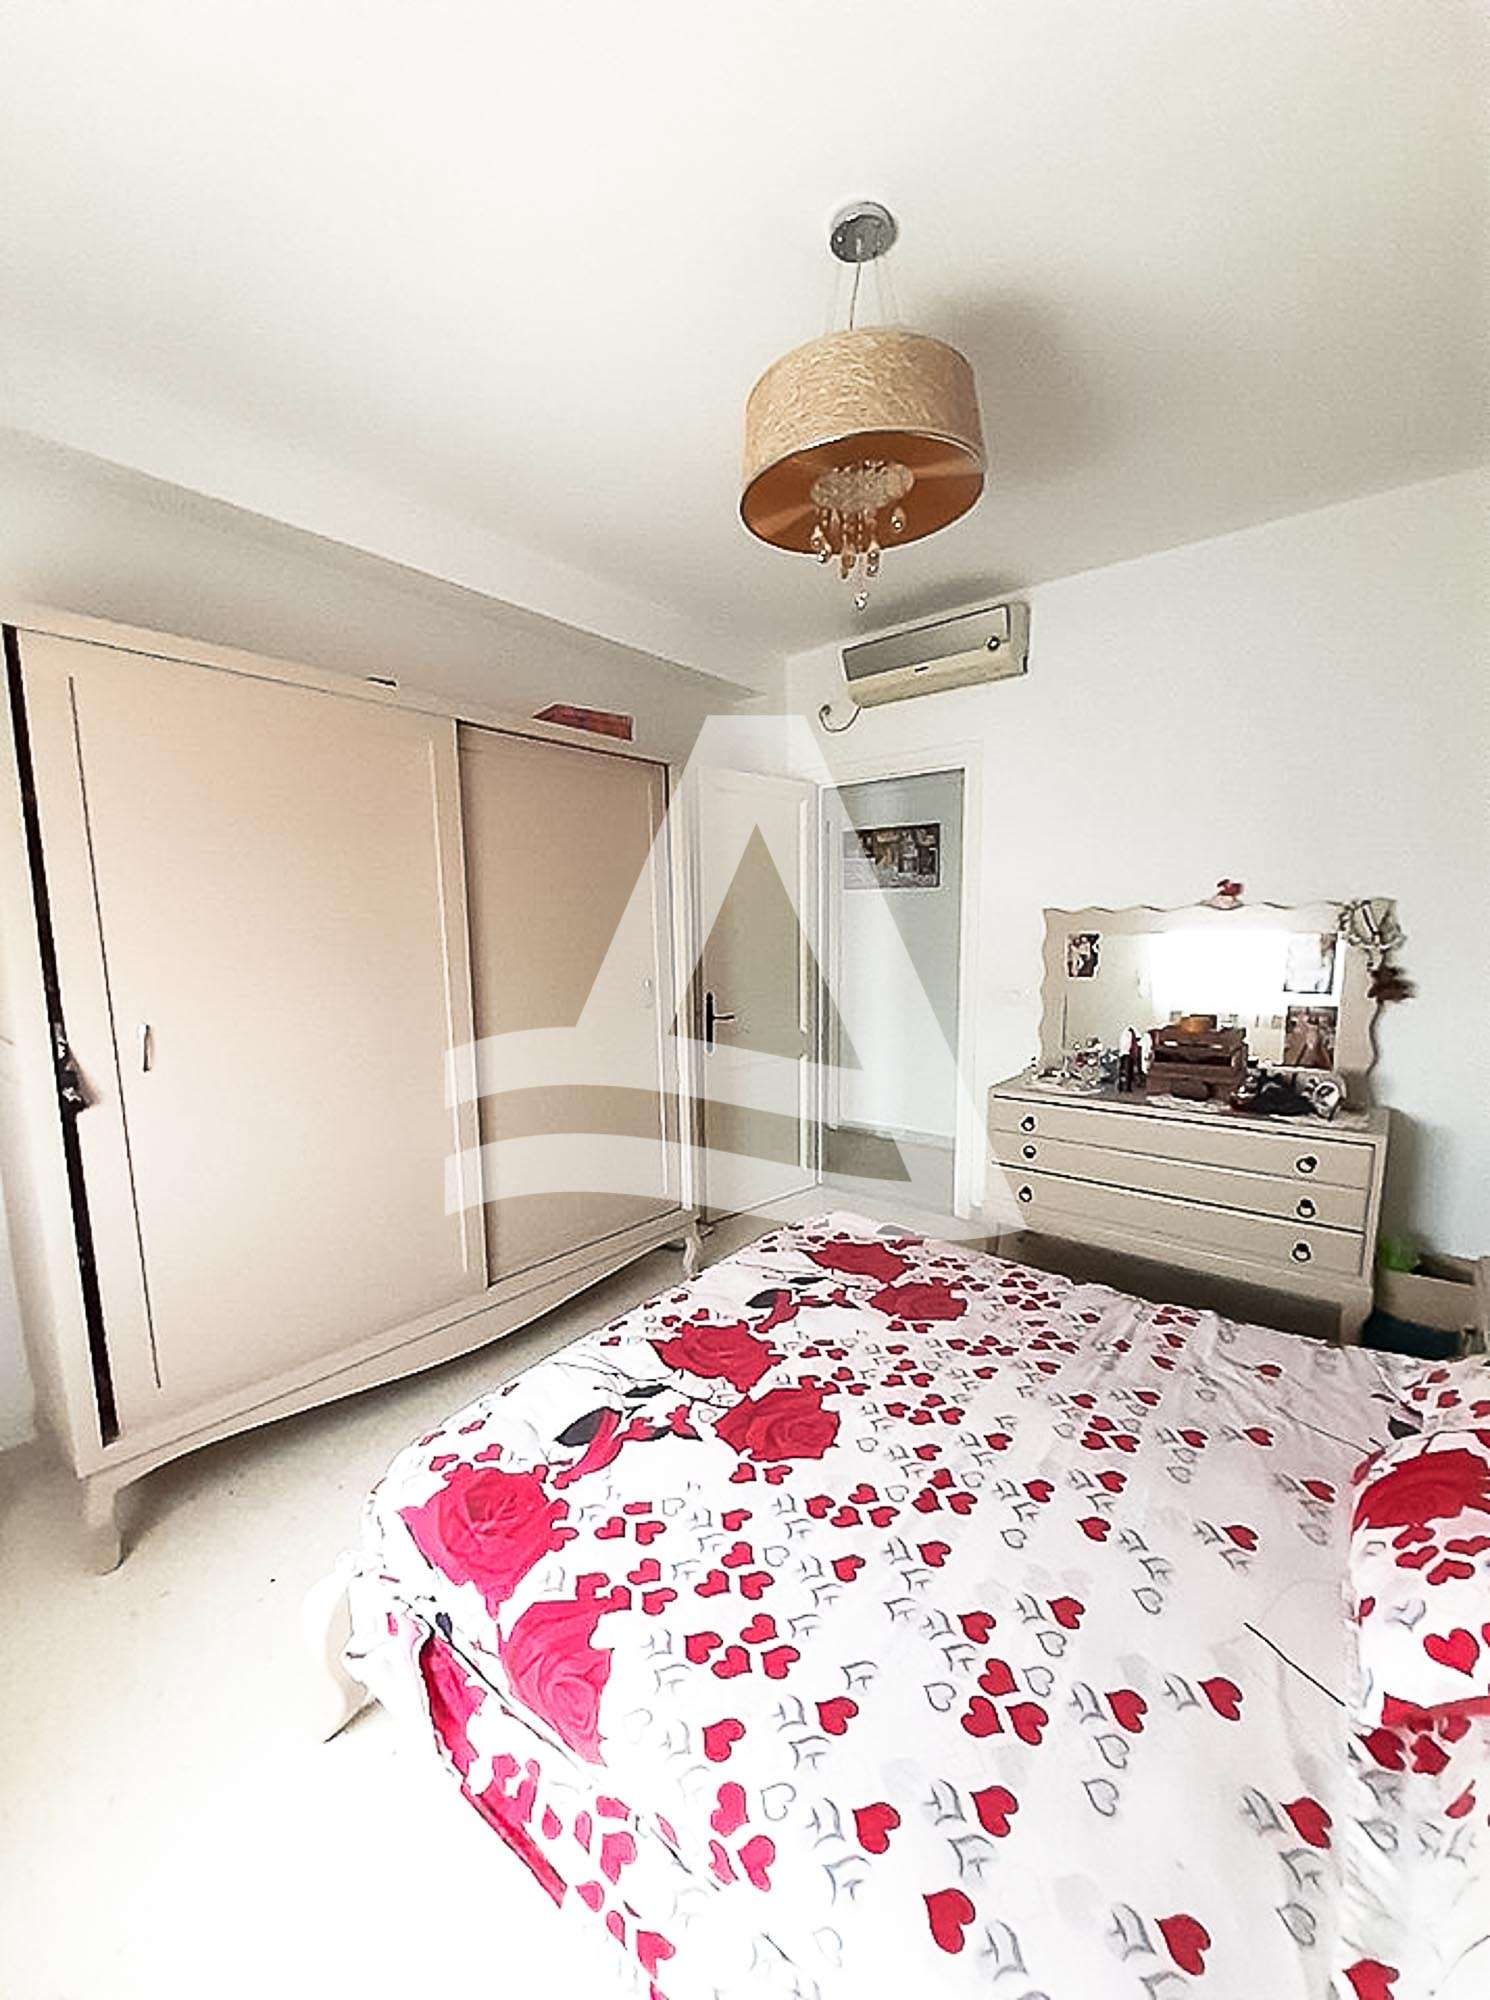 httpss3.amazonaws.comlogimoaws_Arcane_immobilière_la_Marsa-_location_-_vente_la_marsa_10_sur_16_1574071698432-1